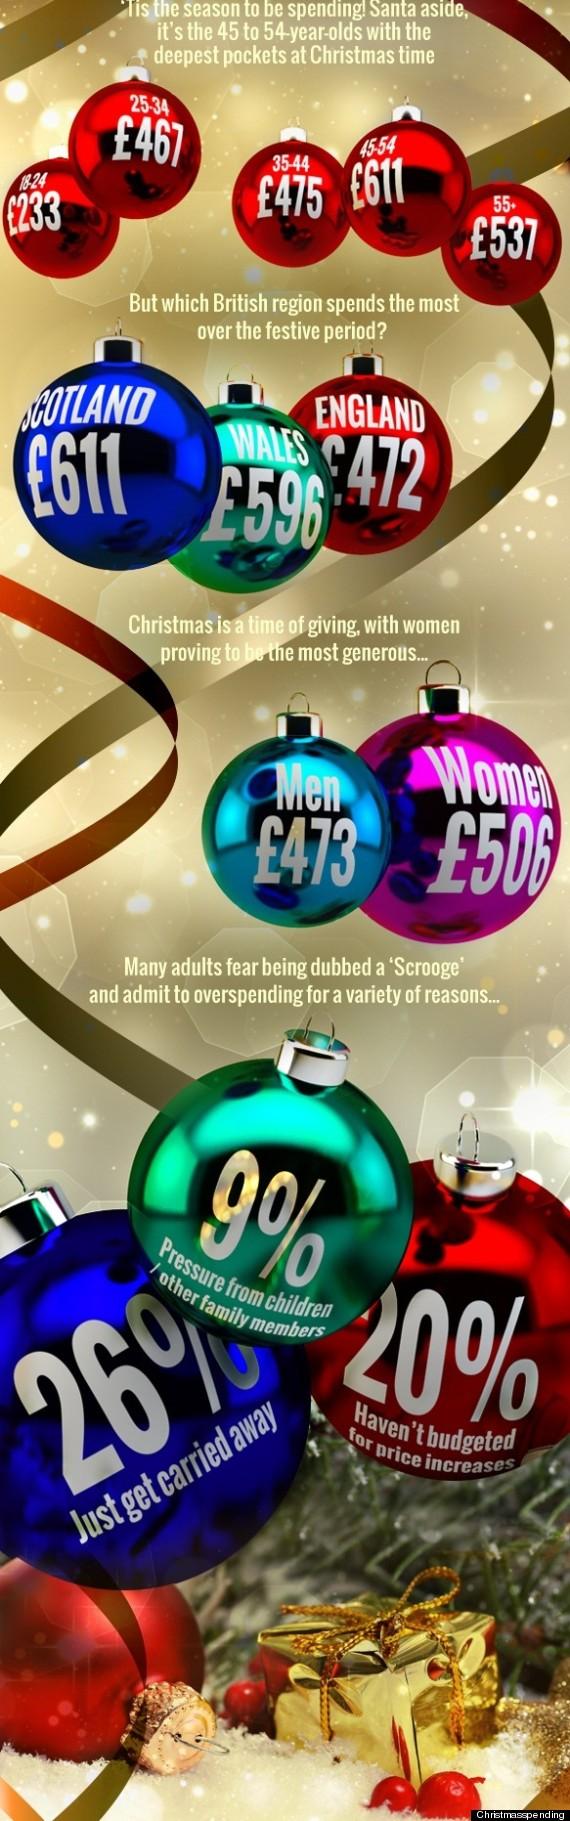 christmasspending